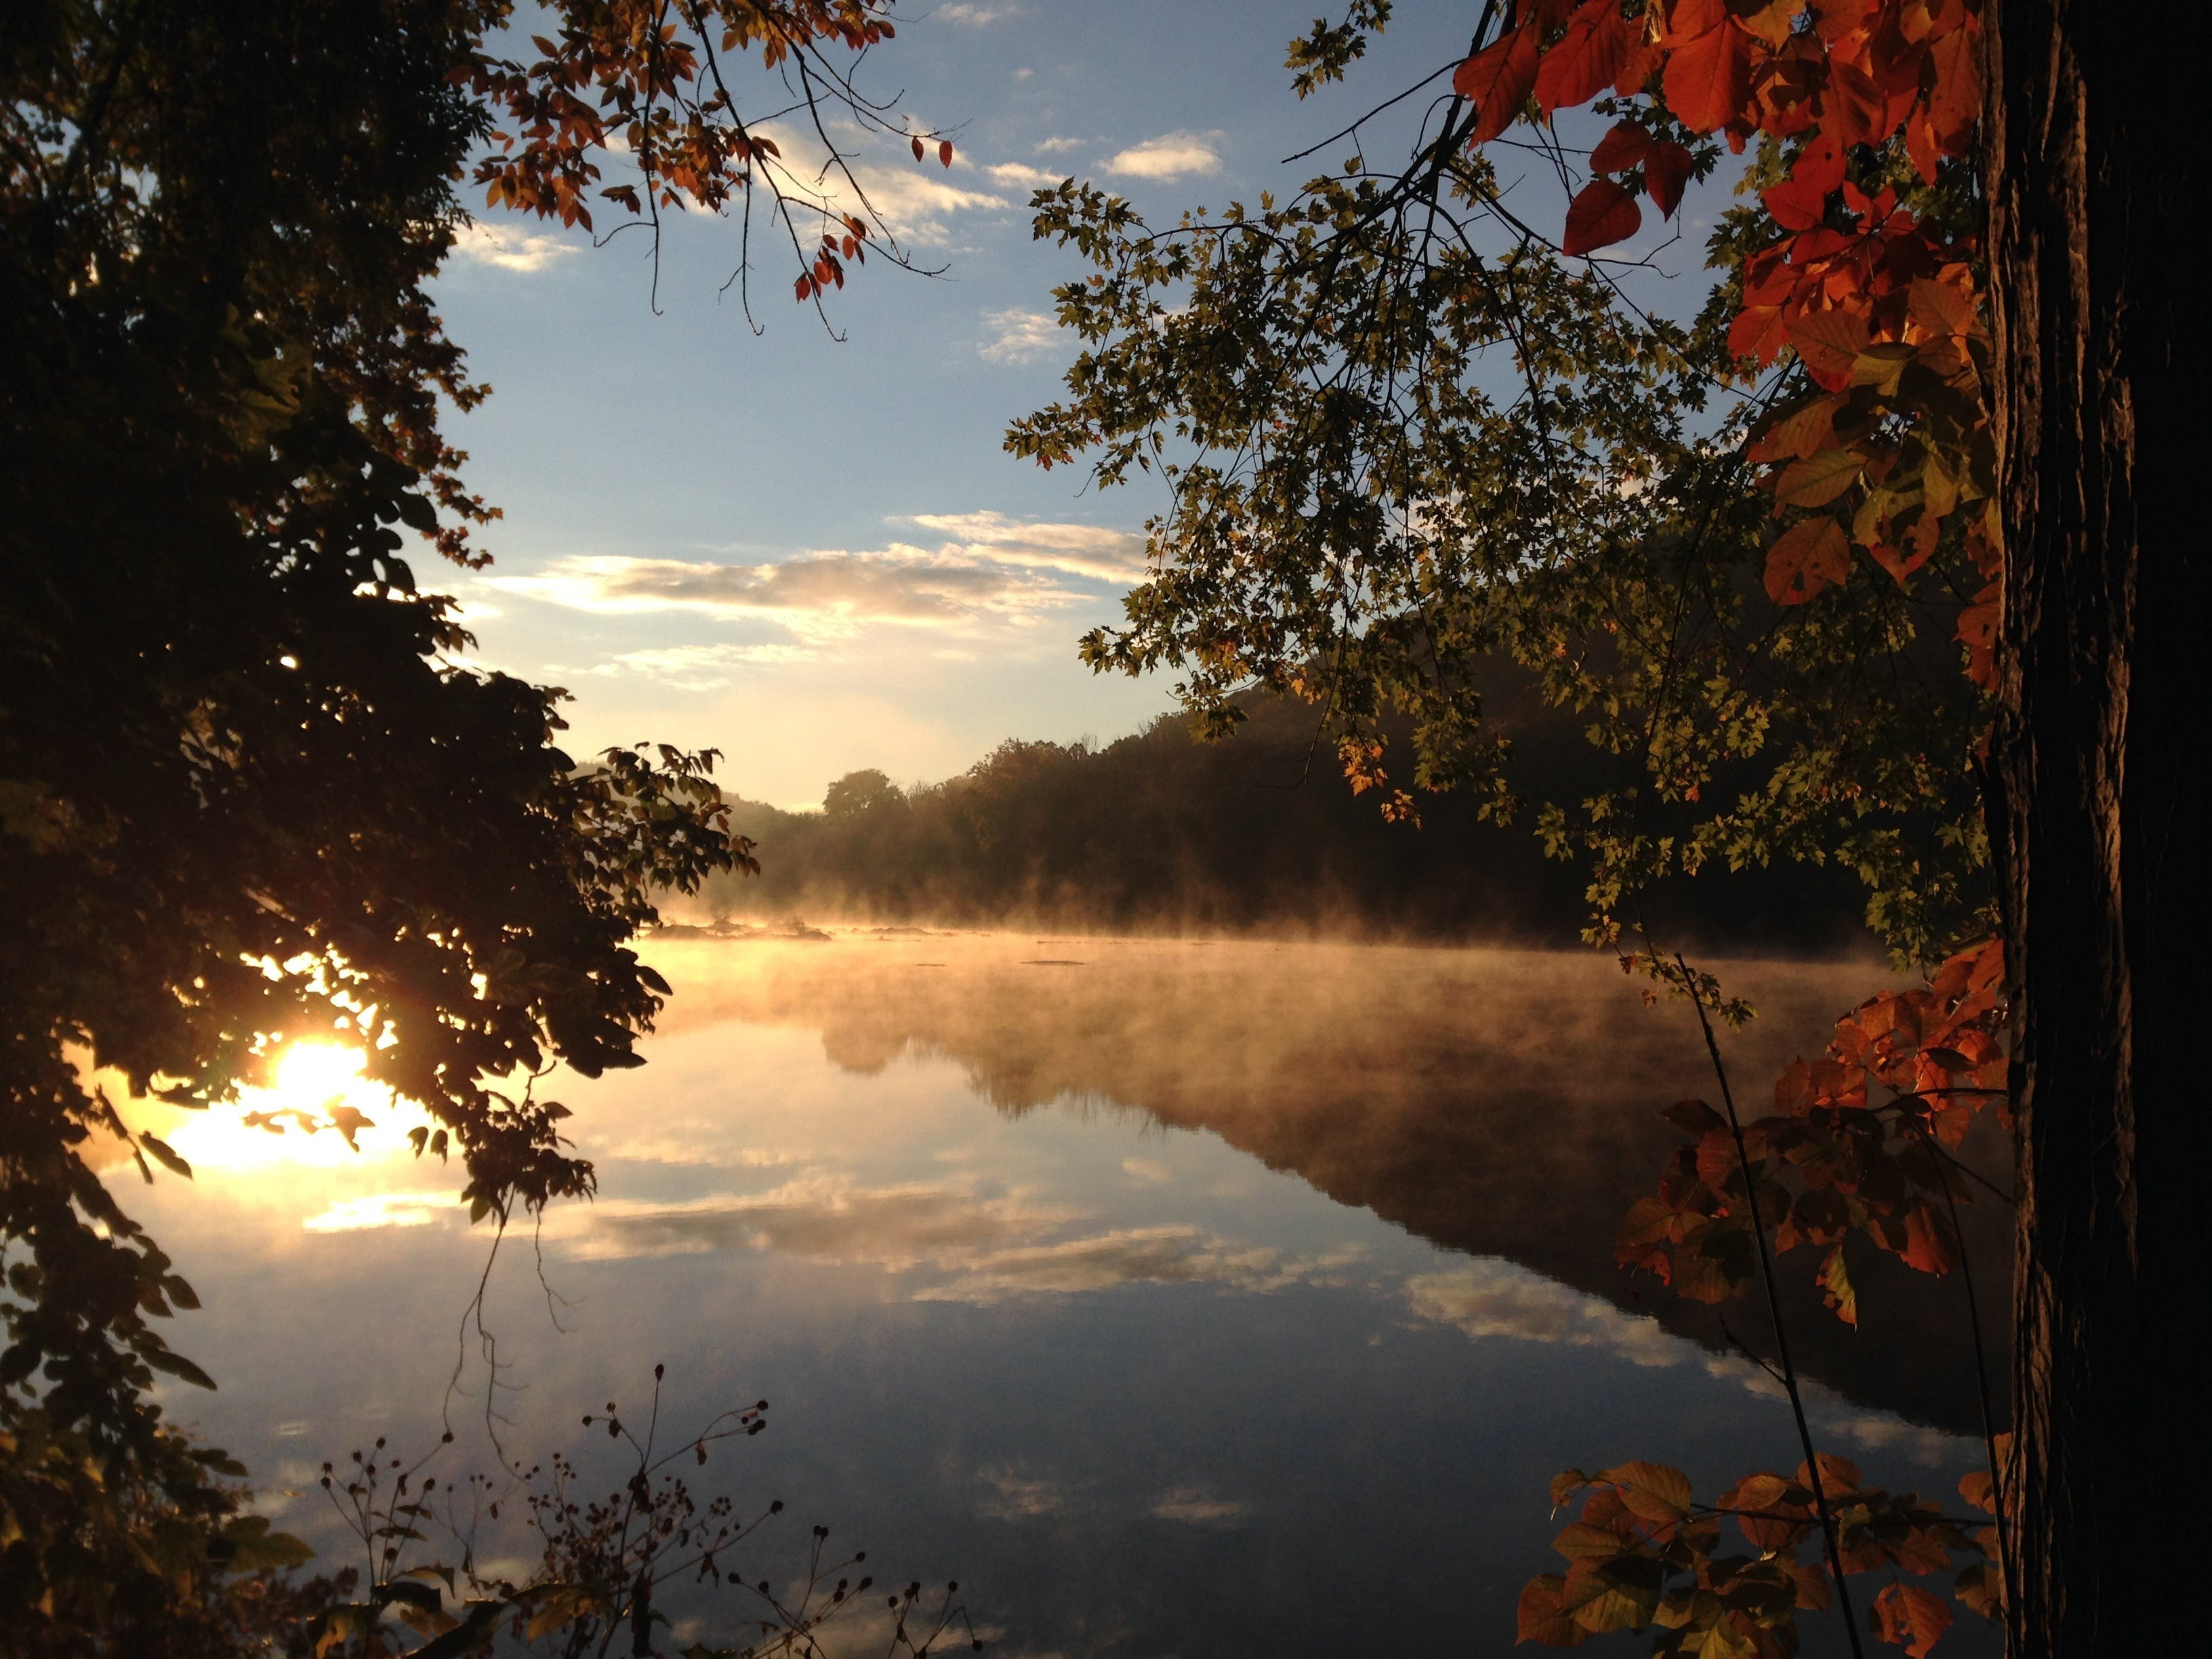 Lake Overlooking Photo during Daytime